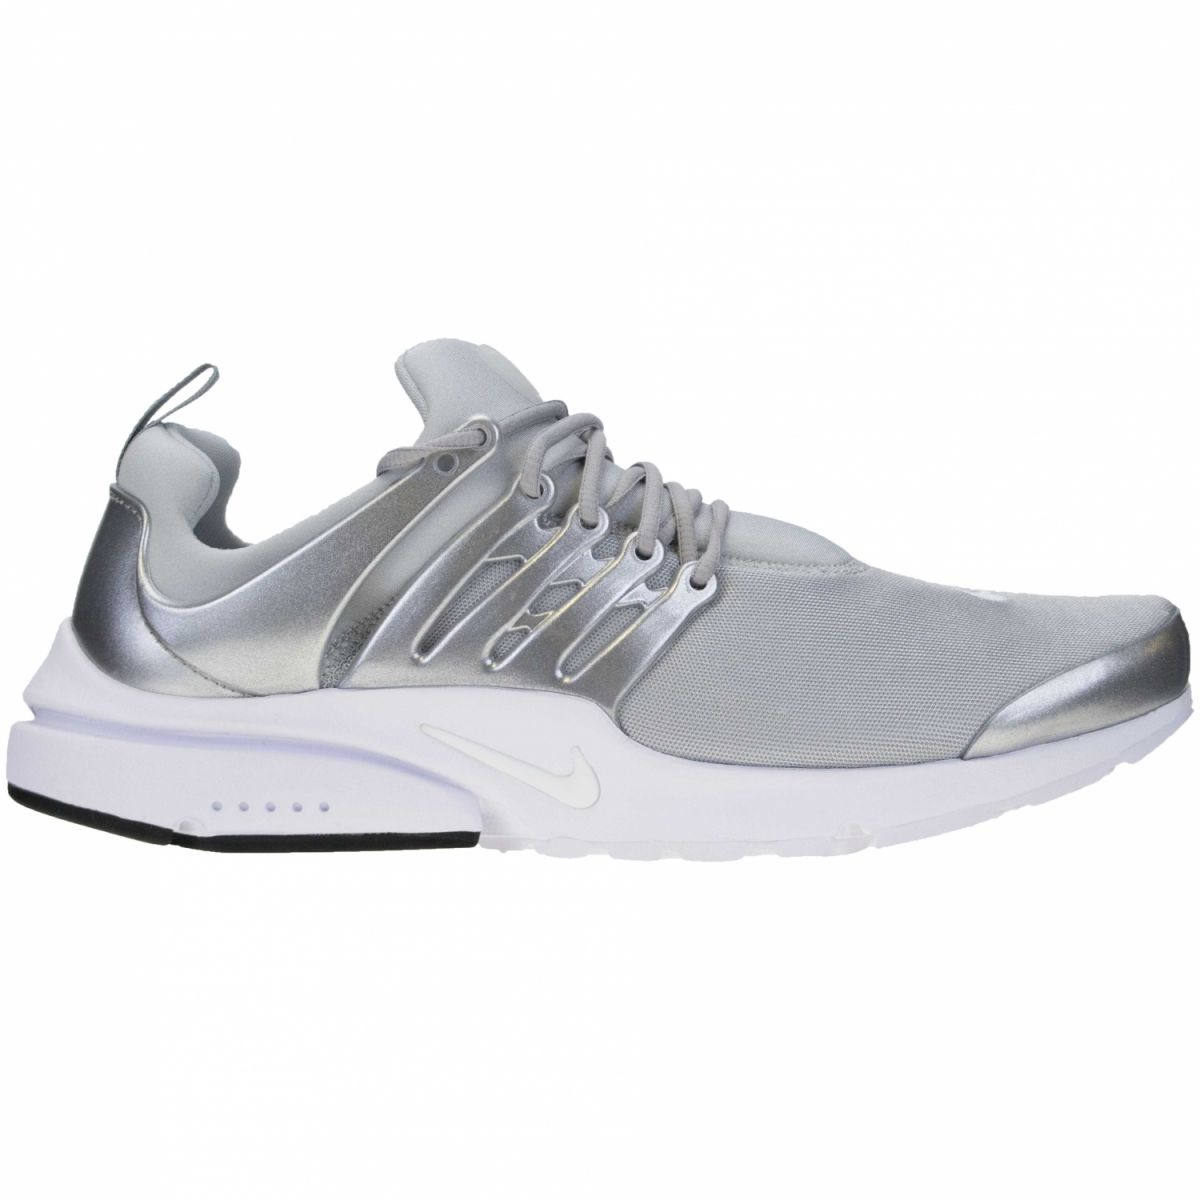 sports shoes f904b 59830 ... promo code for nike air presto premium sneaker herren schuhe silber  weiß 5d0cf 6f9ec